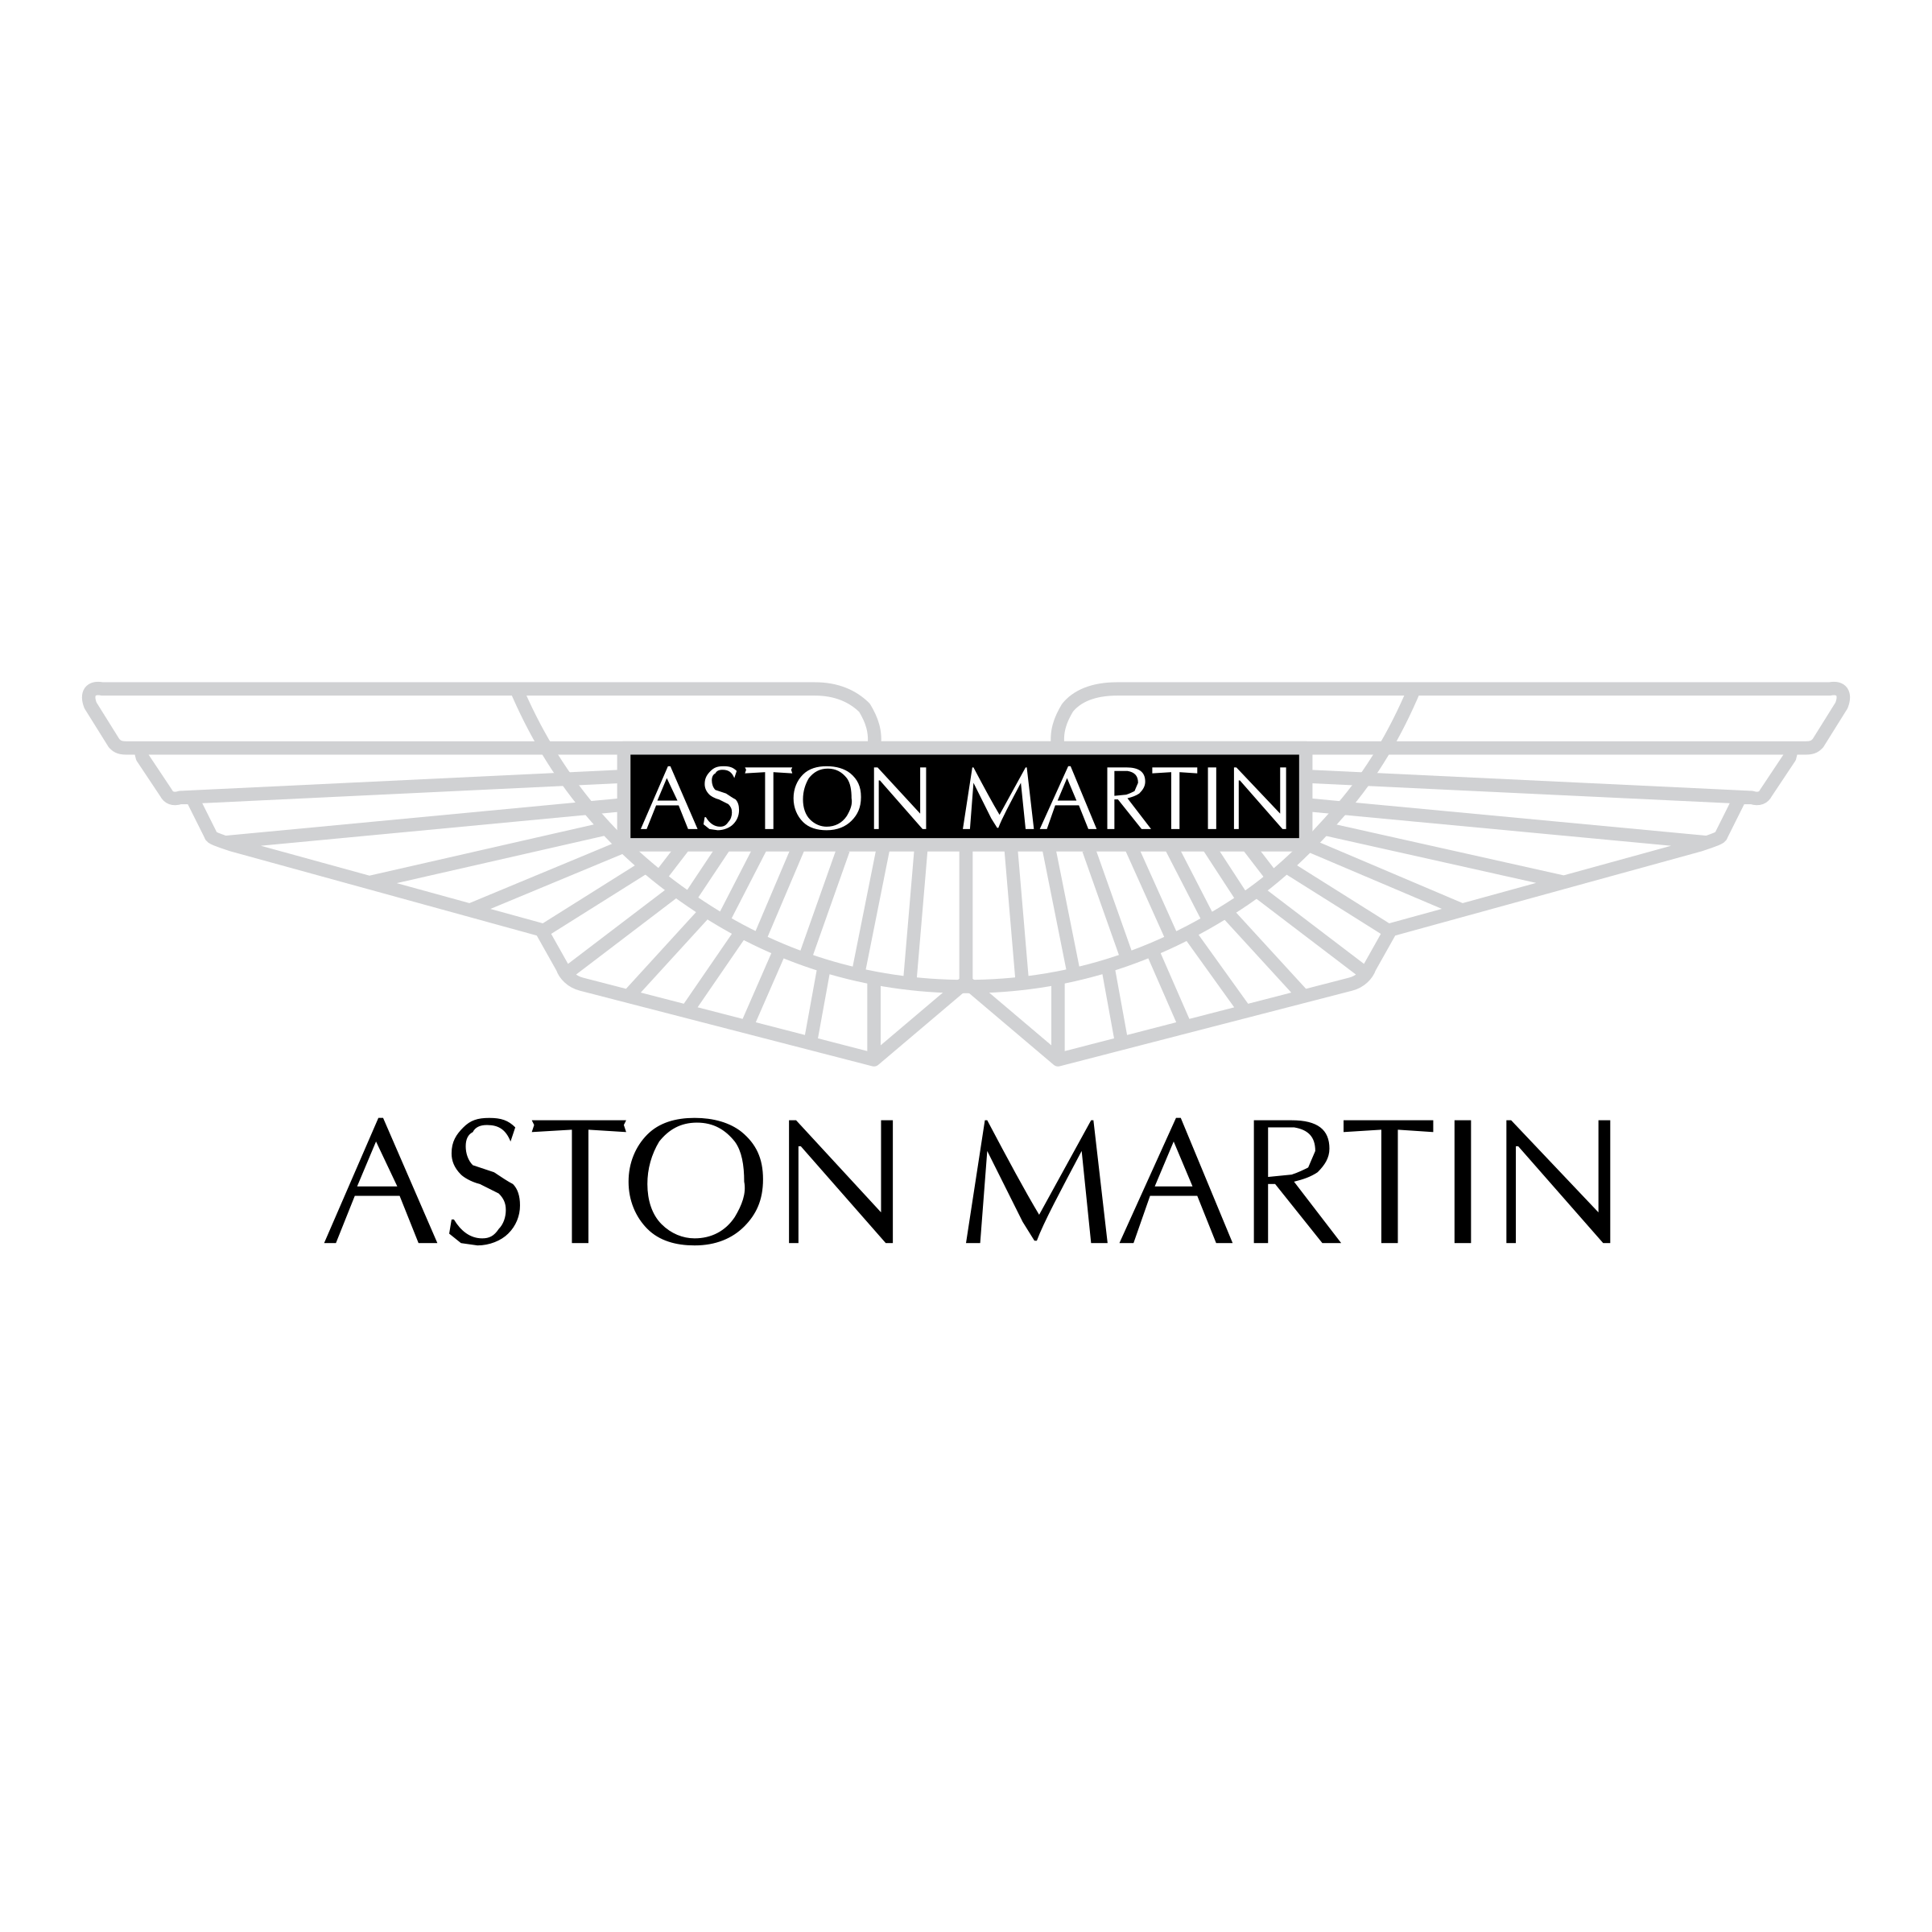 Aston Martin Logo Png Transparent Svg Vector Freebie Supply